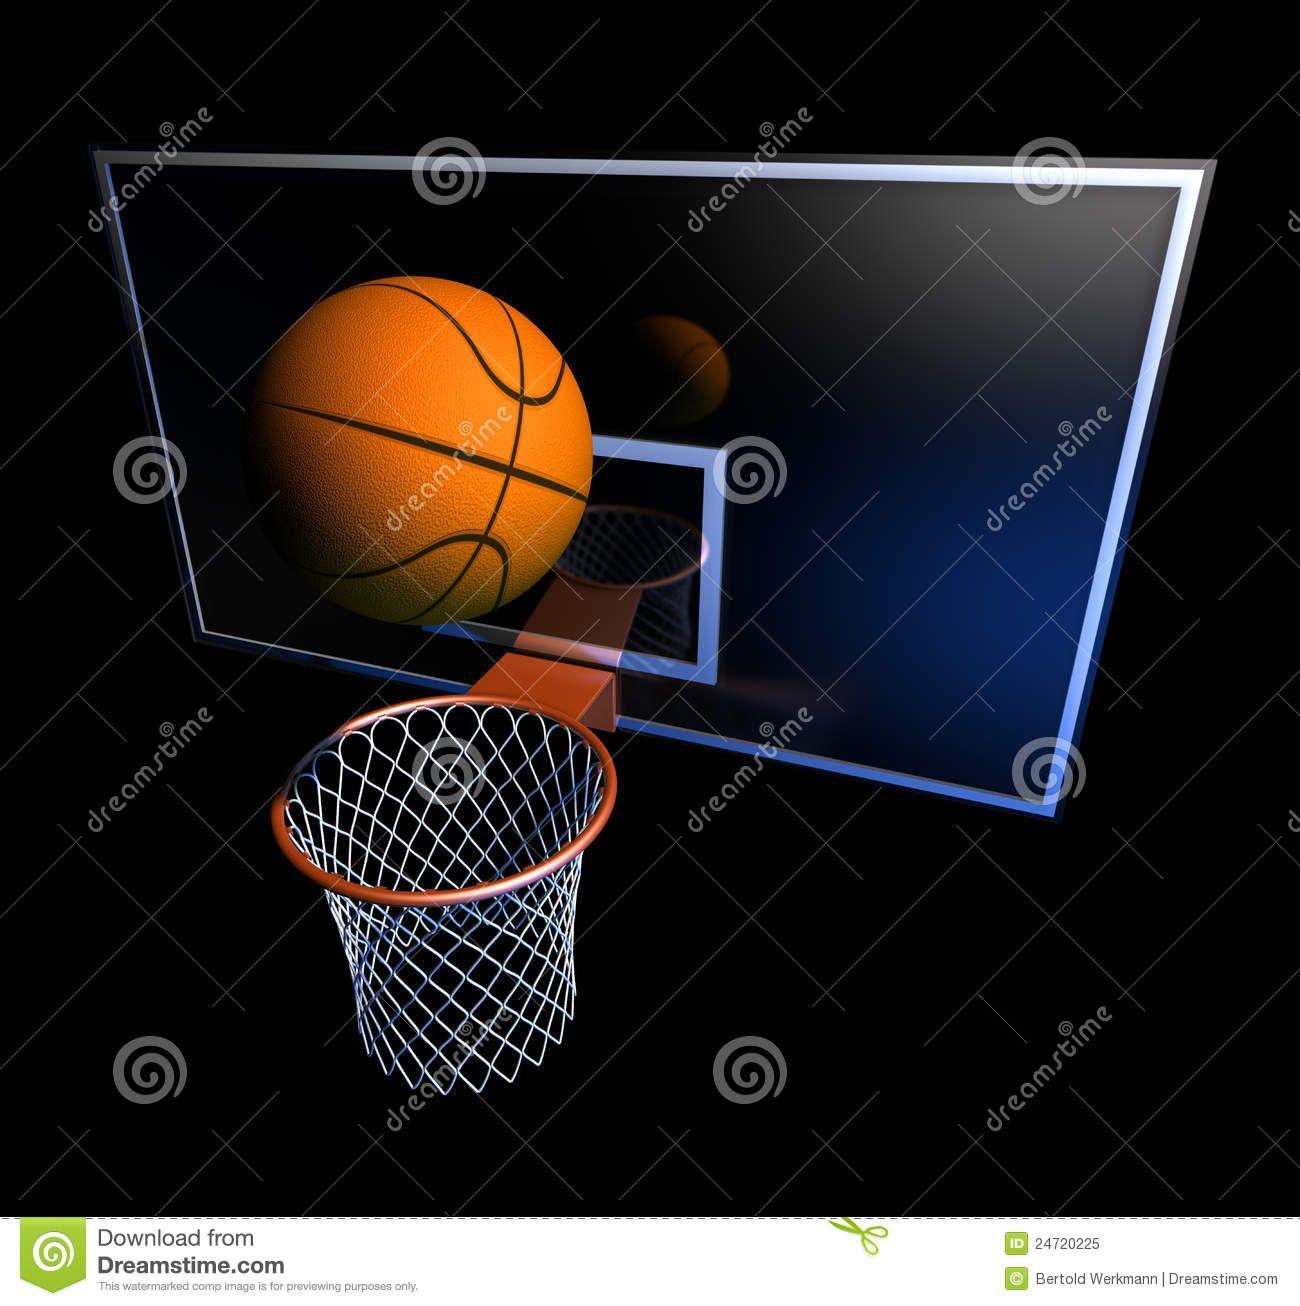 Basketball Hoop and Ball | Royalty Free Stock Photo: Basketball hoop and ball